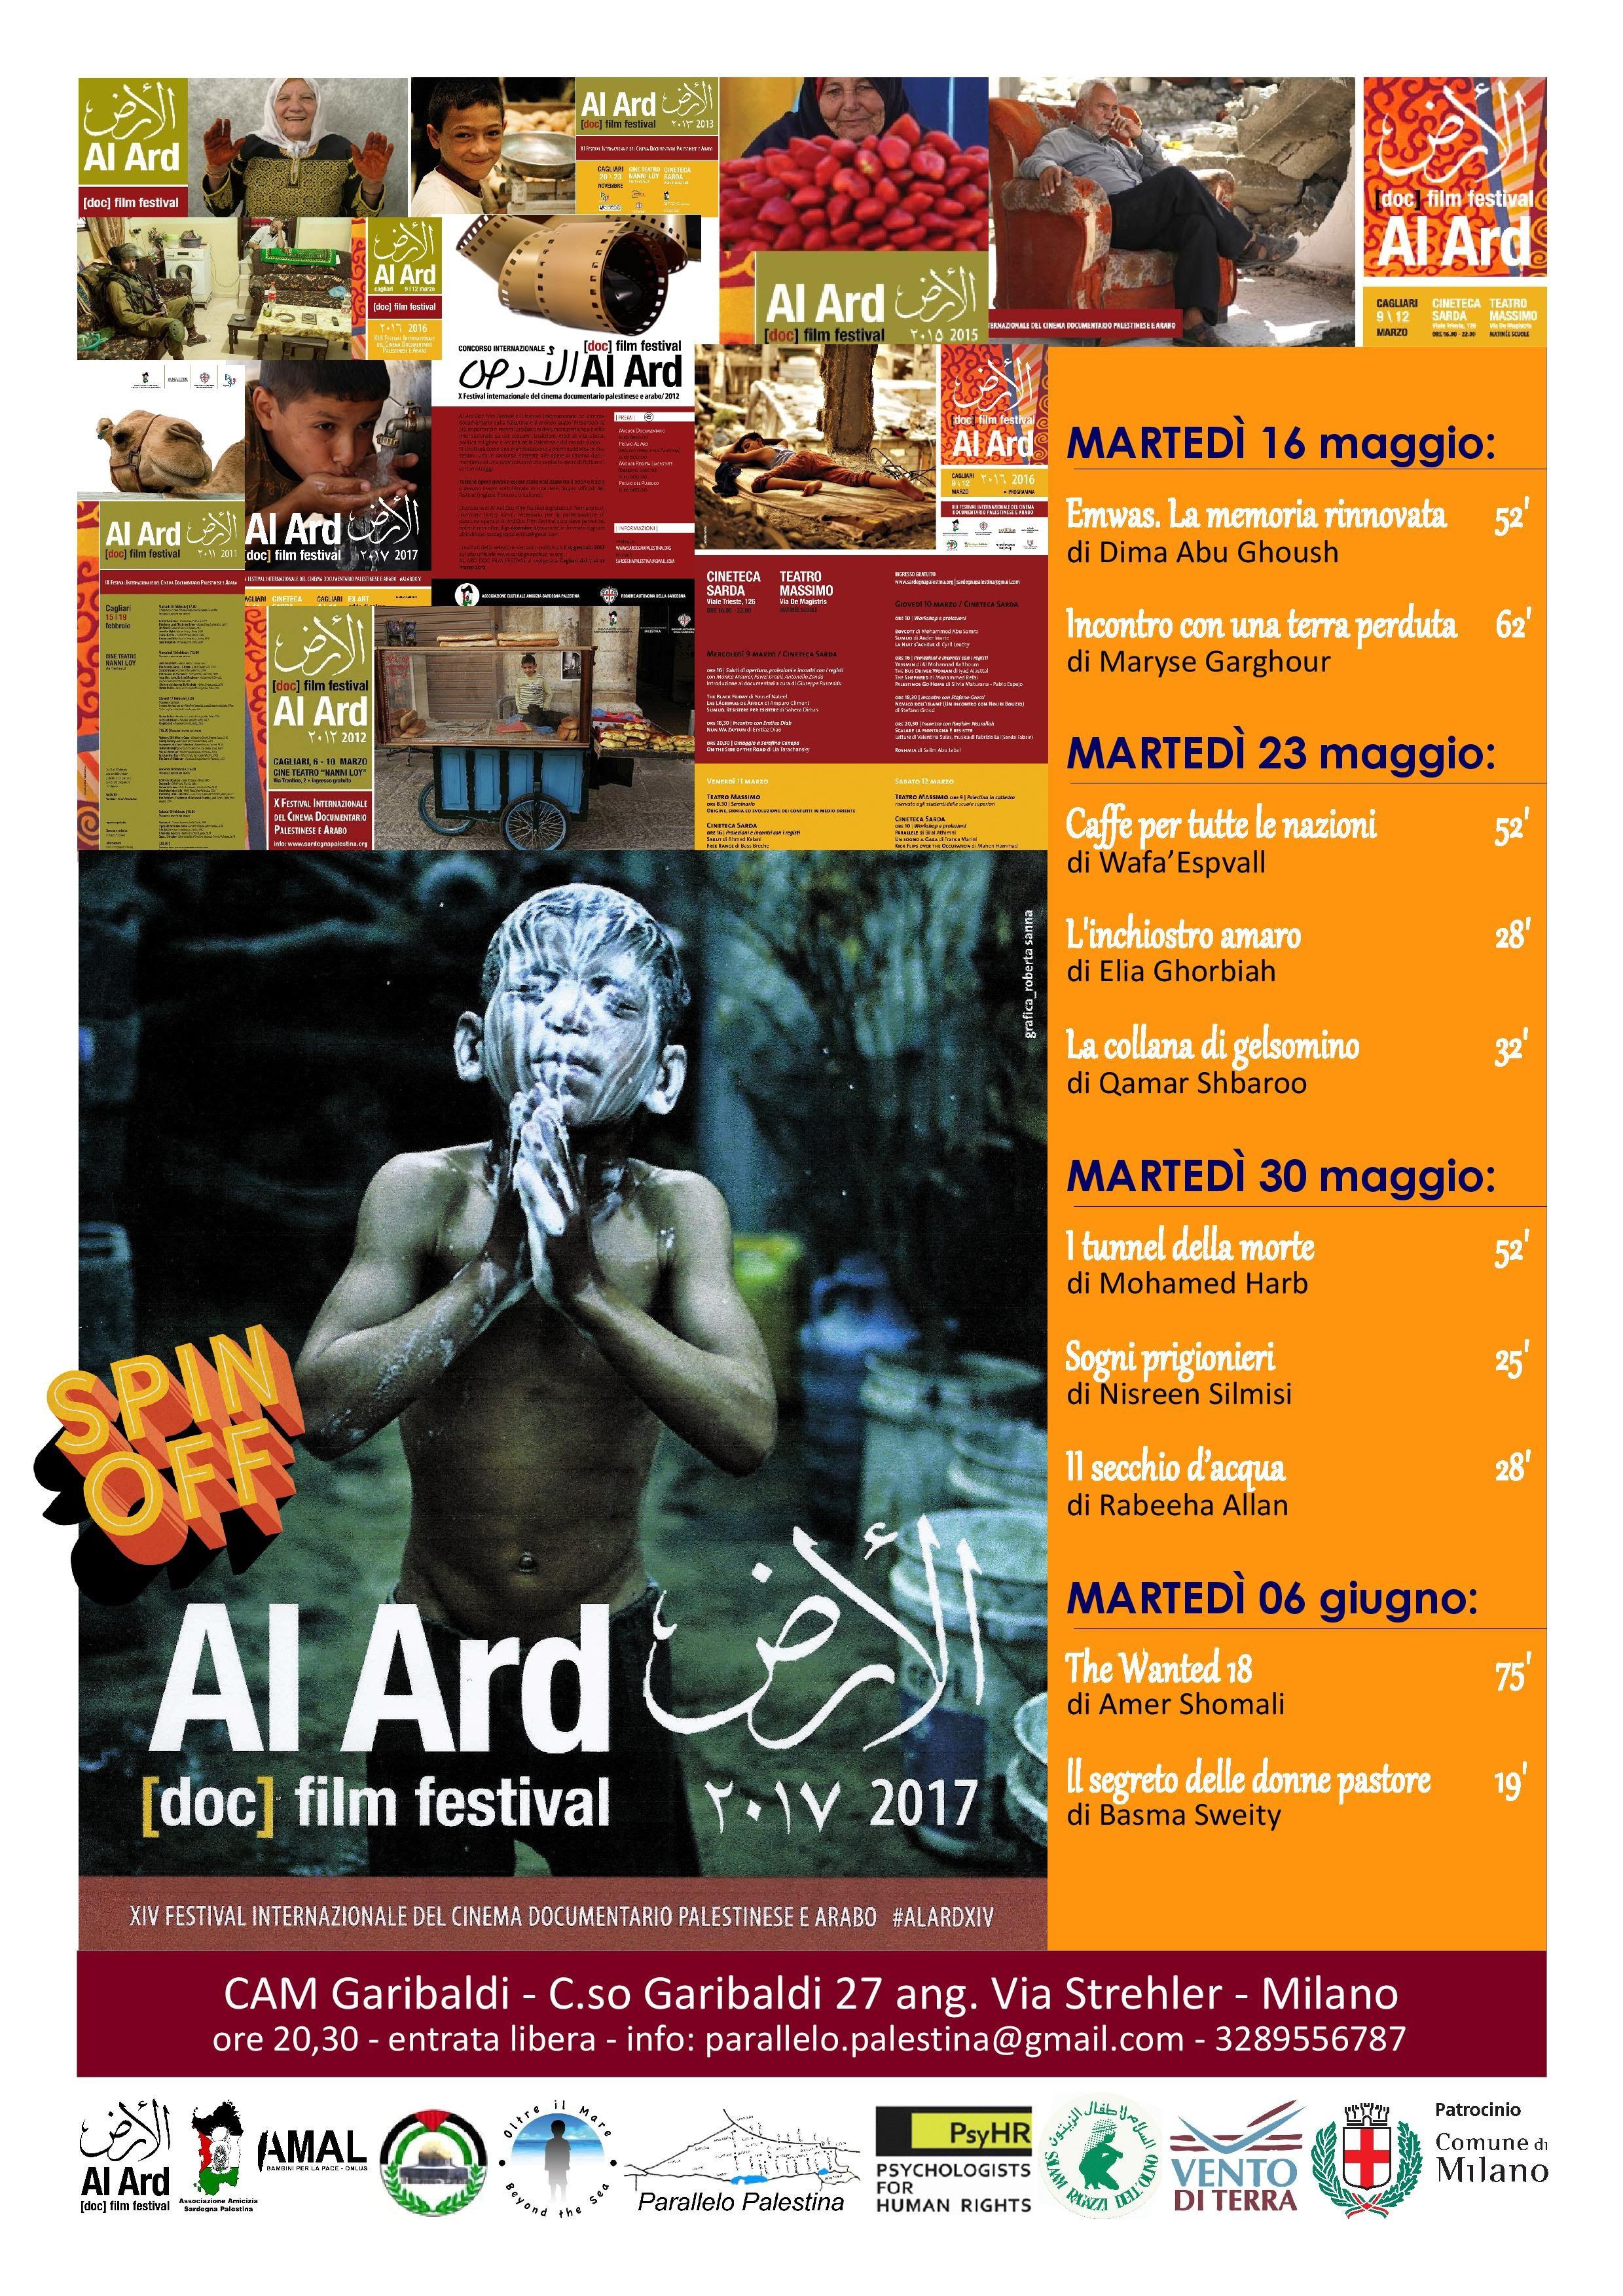 Al Ard [doc] film festival 2017